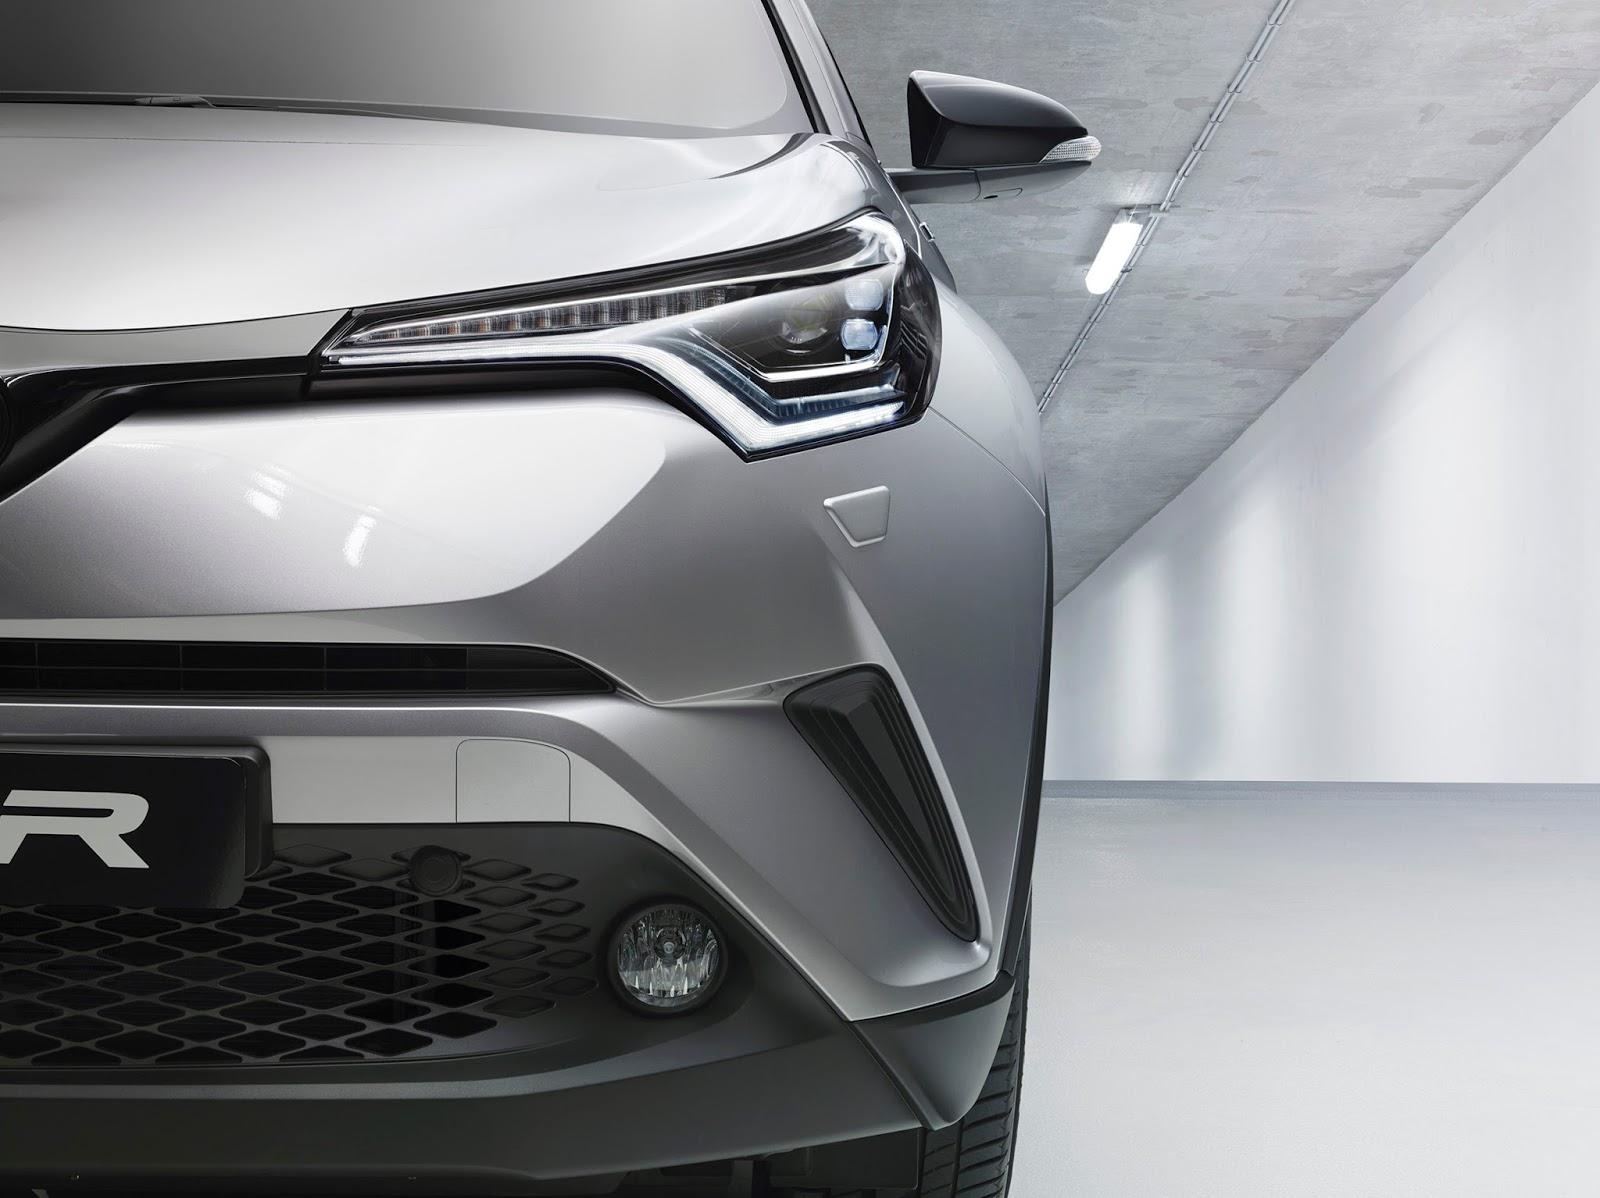 2017-Toyota-C-HR-02.jpg